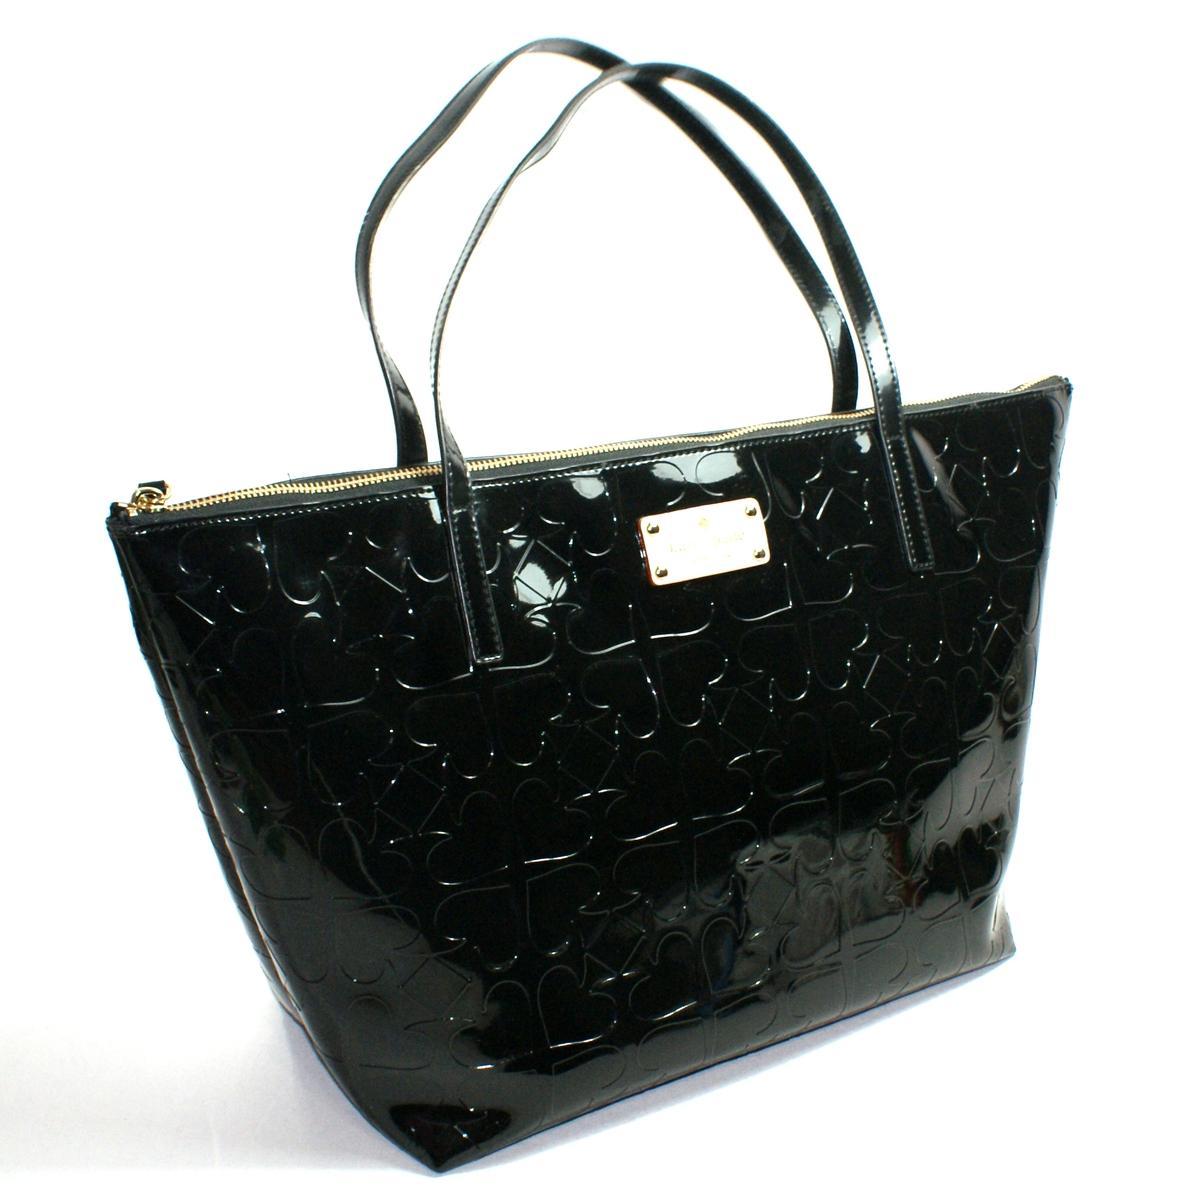 Kate Spade Leather Tote Black